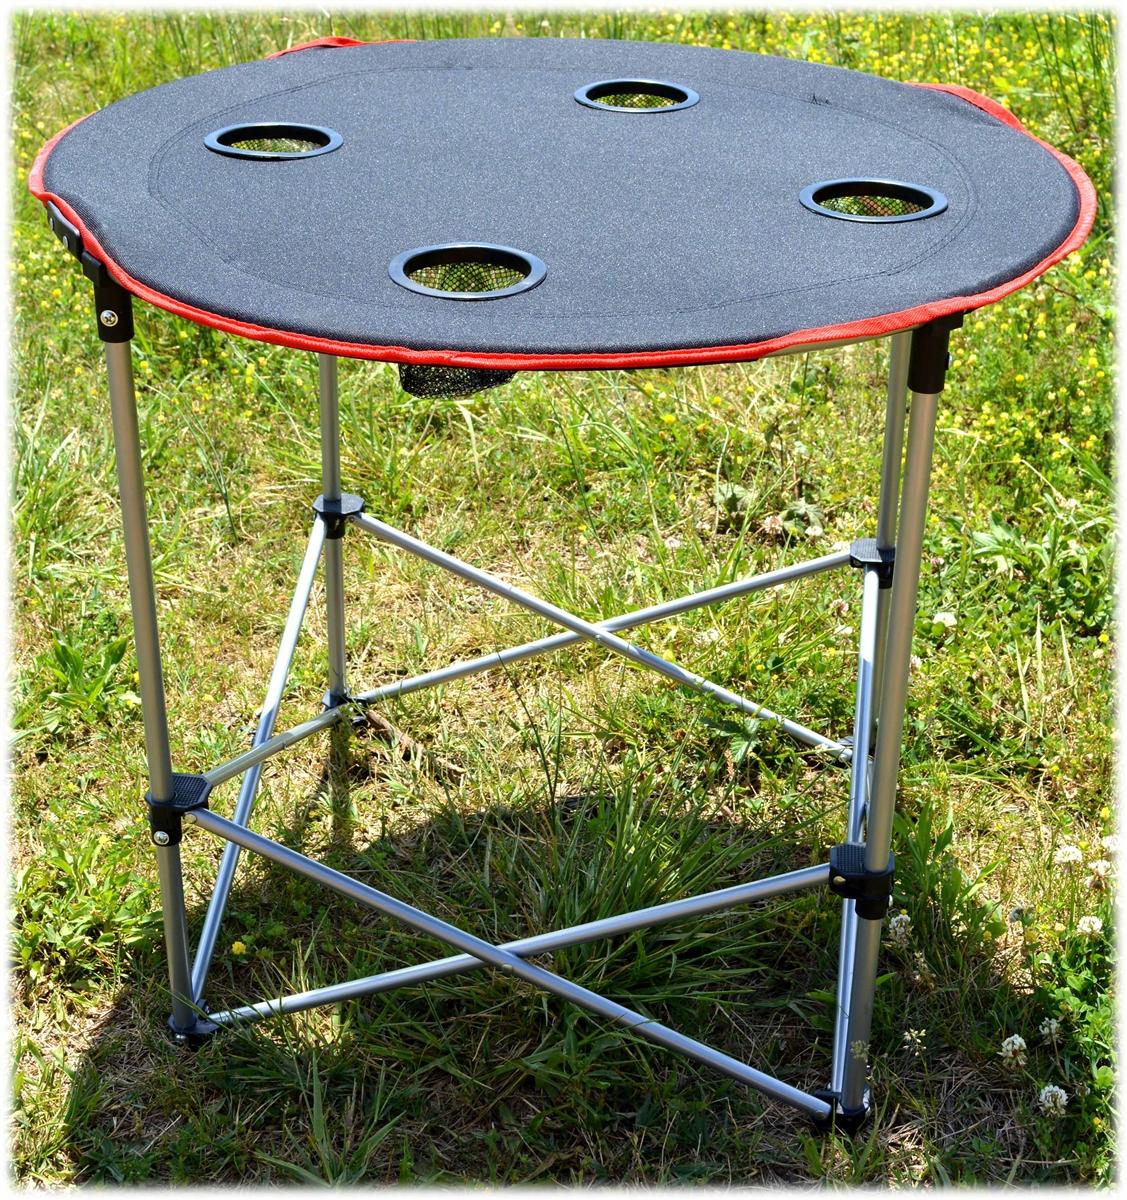 round folding camping table - 35900 WHZIXQZ